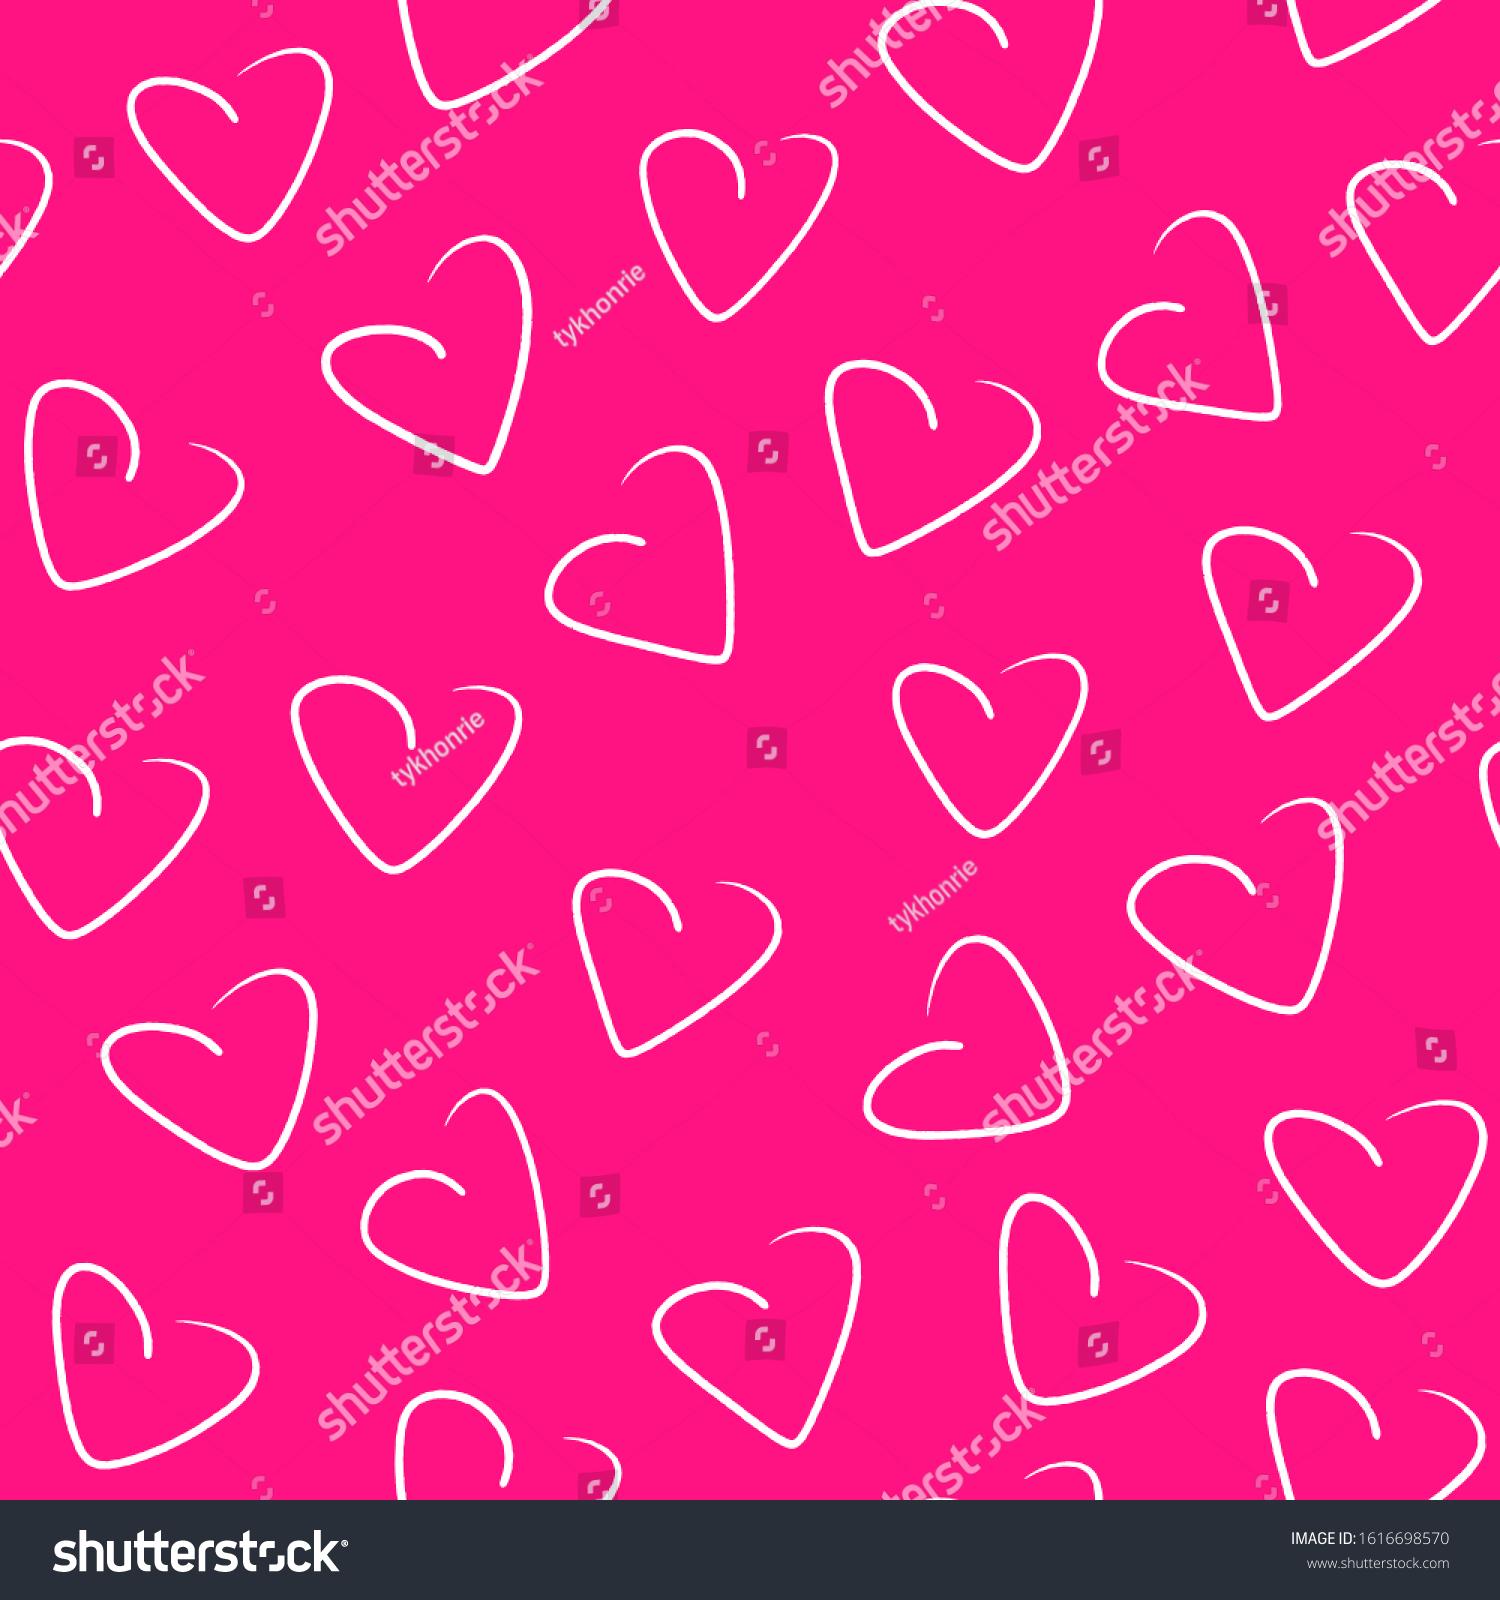 stock-photo-handdrawn-heart-square-frame